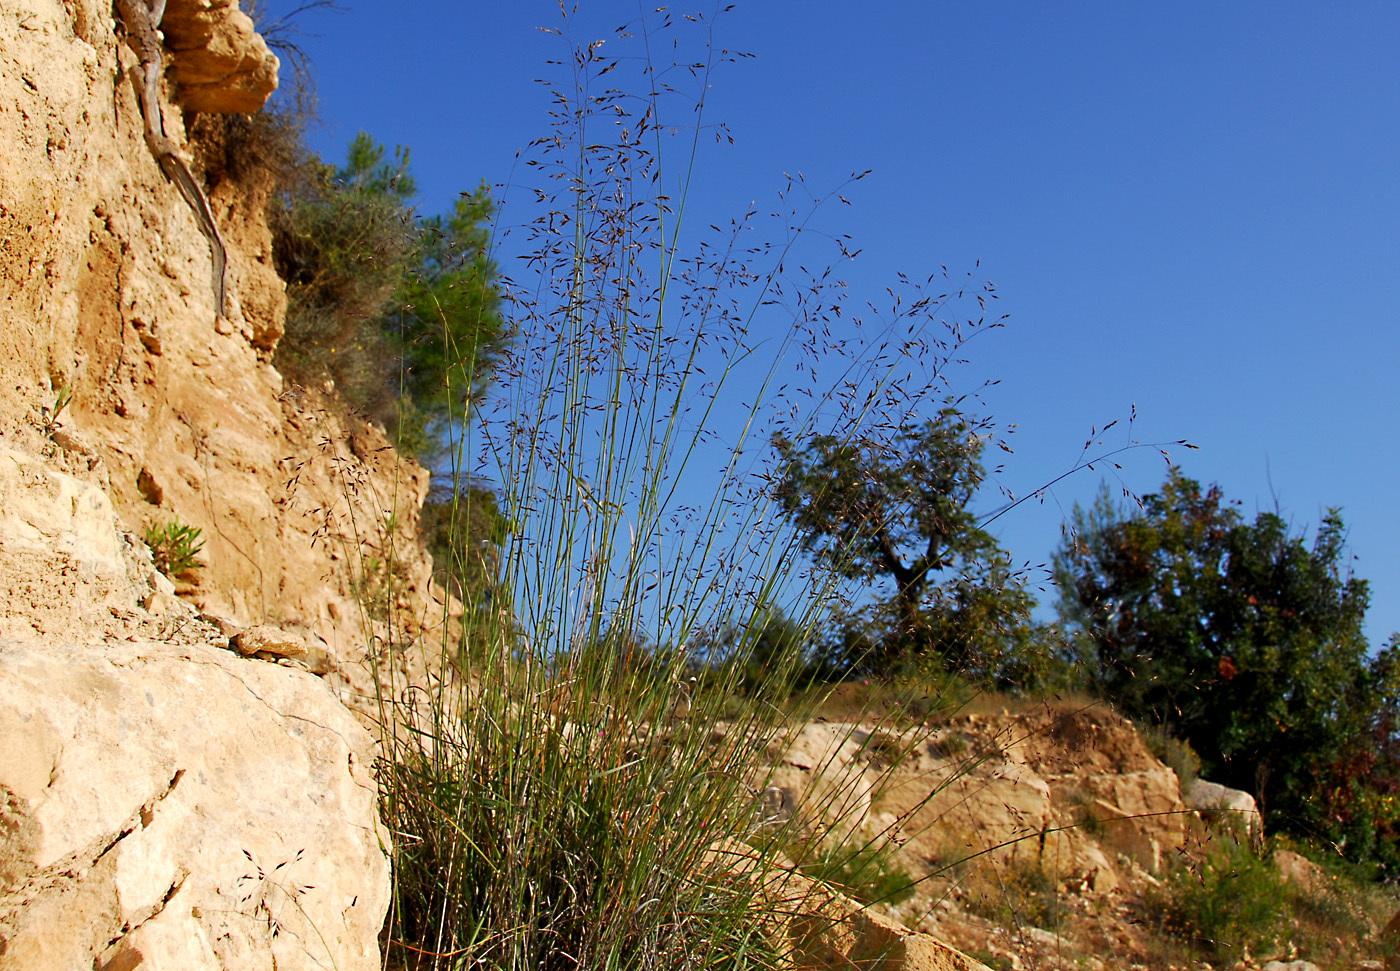 https://pictures.bgbm.org/digilib/Scaler?fn=Cyprus/Piptatherum_coerulescens_A1.jpg&mo=file